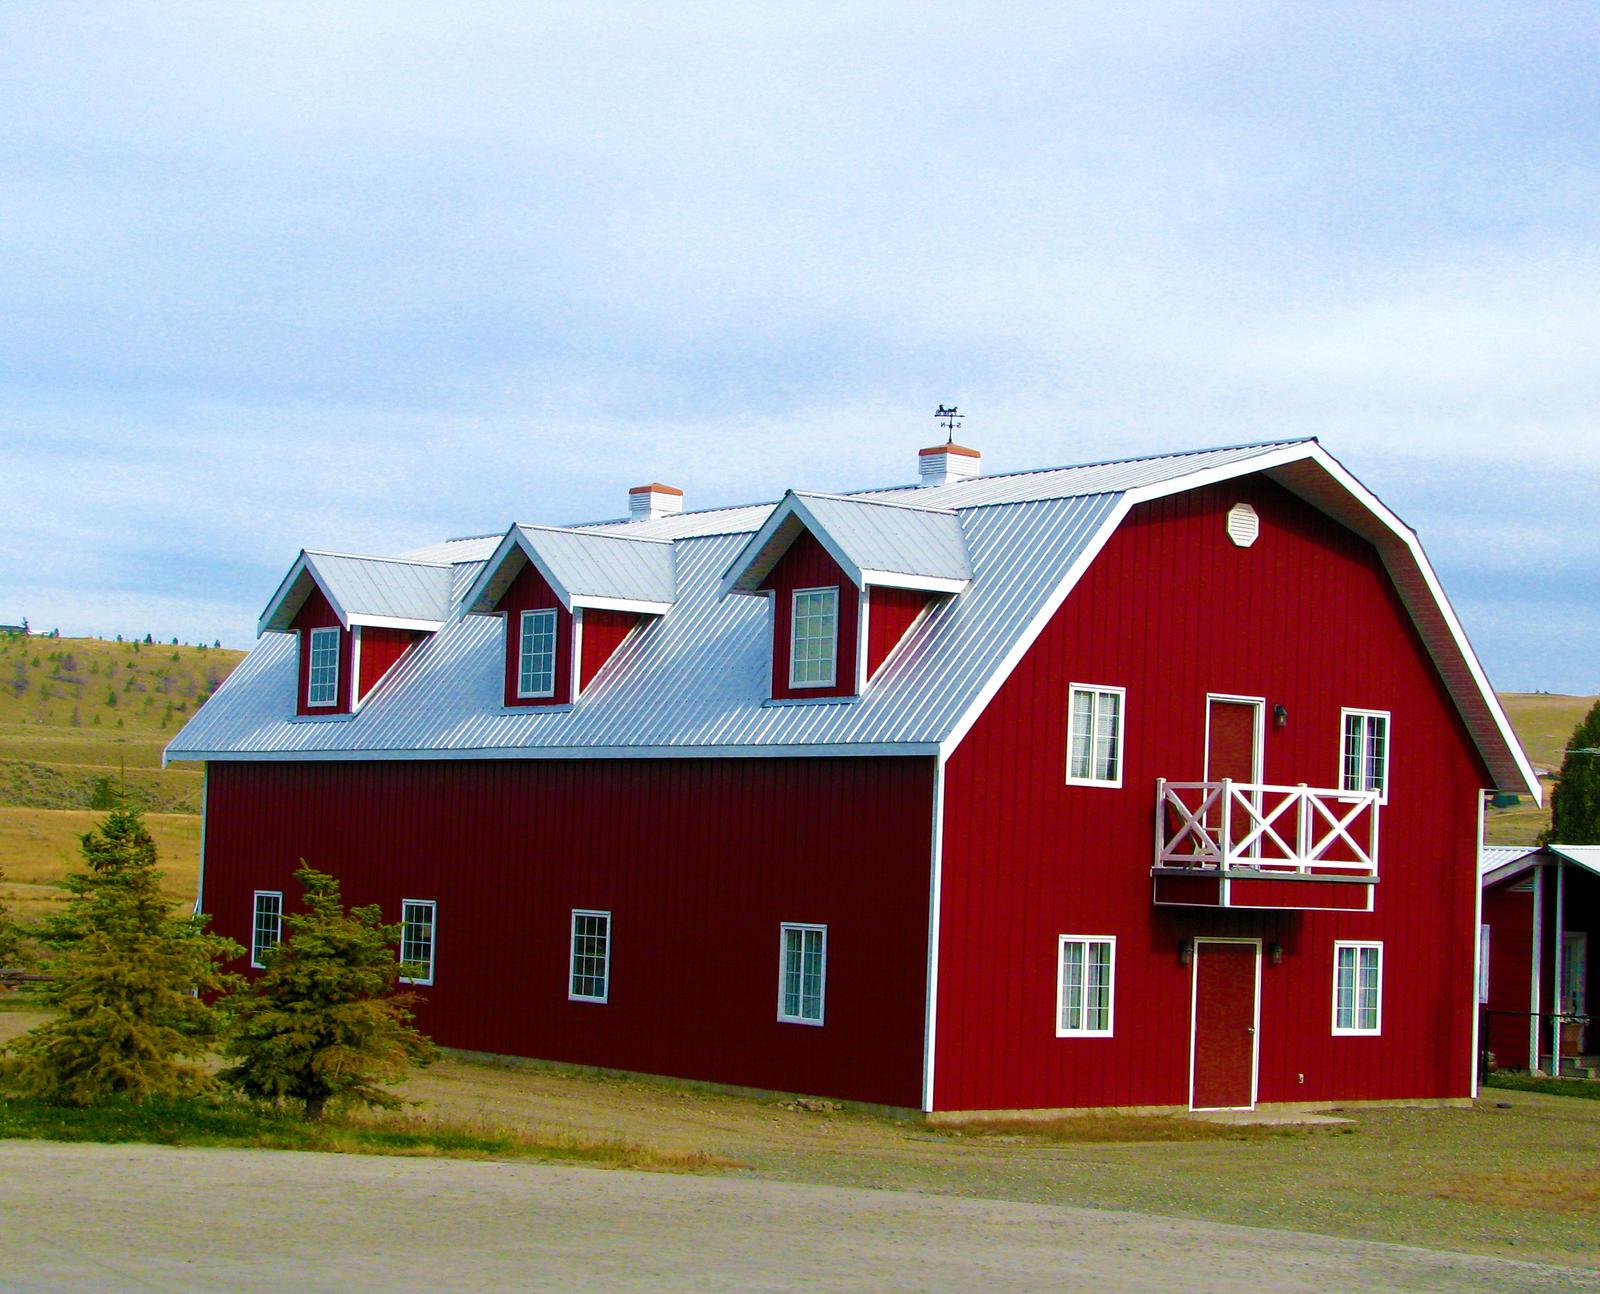 Red Barn Building By Techdrakonic On Deviantart